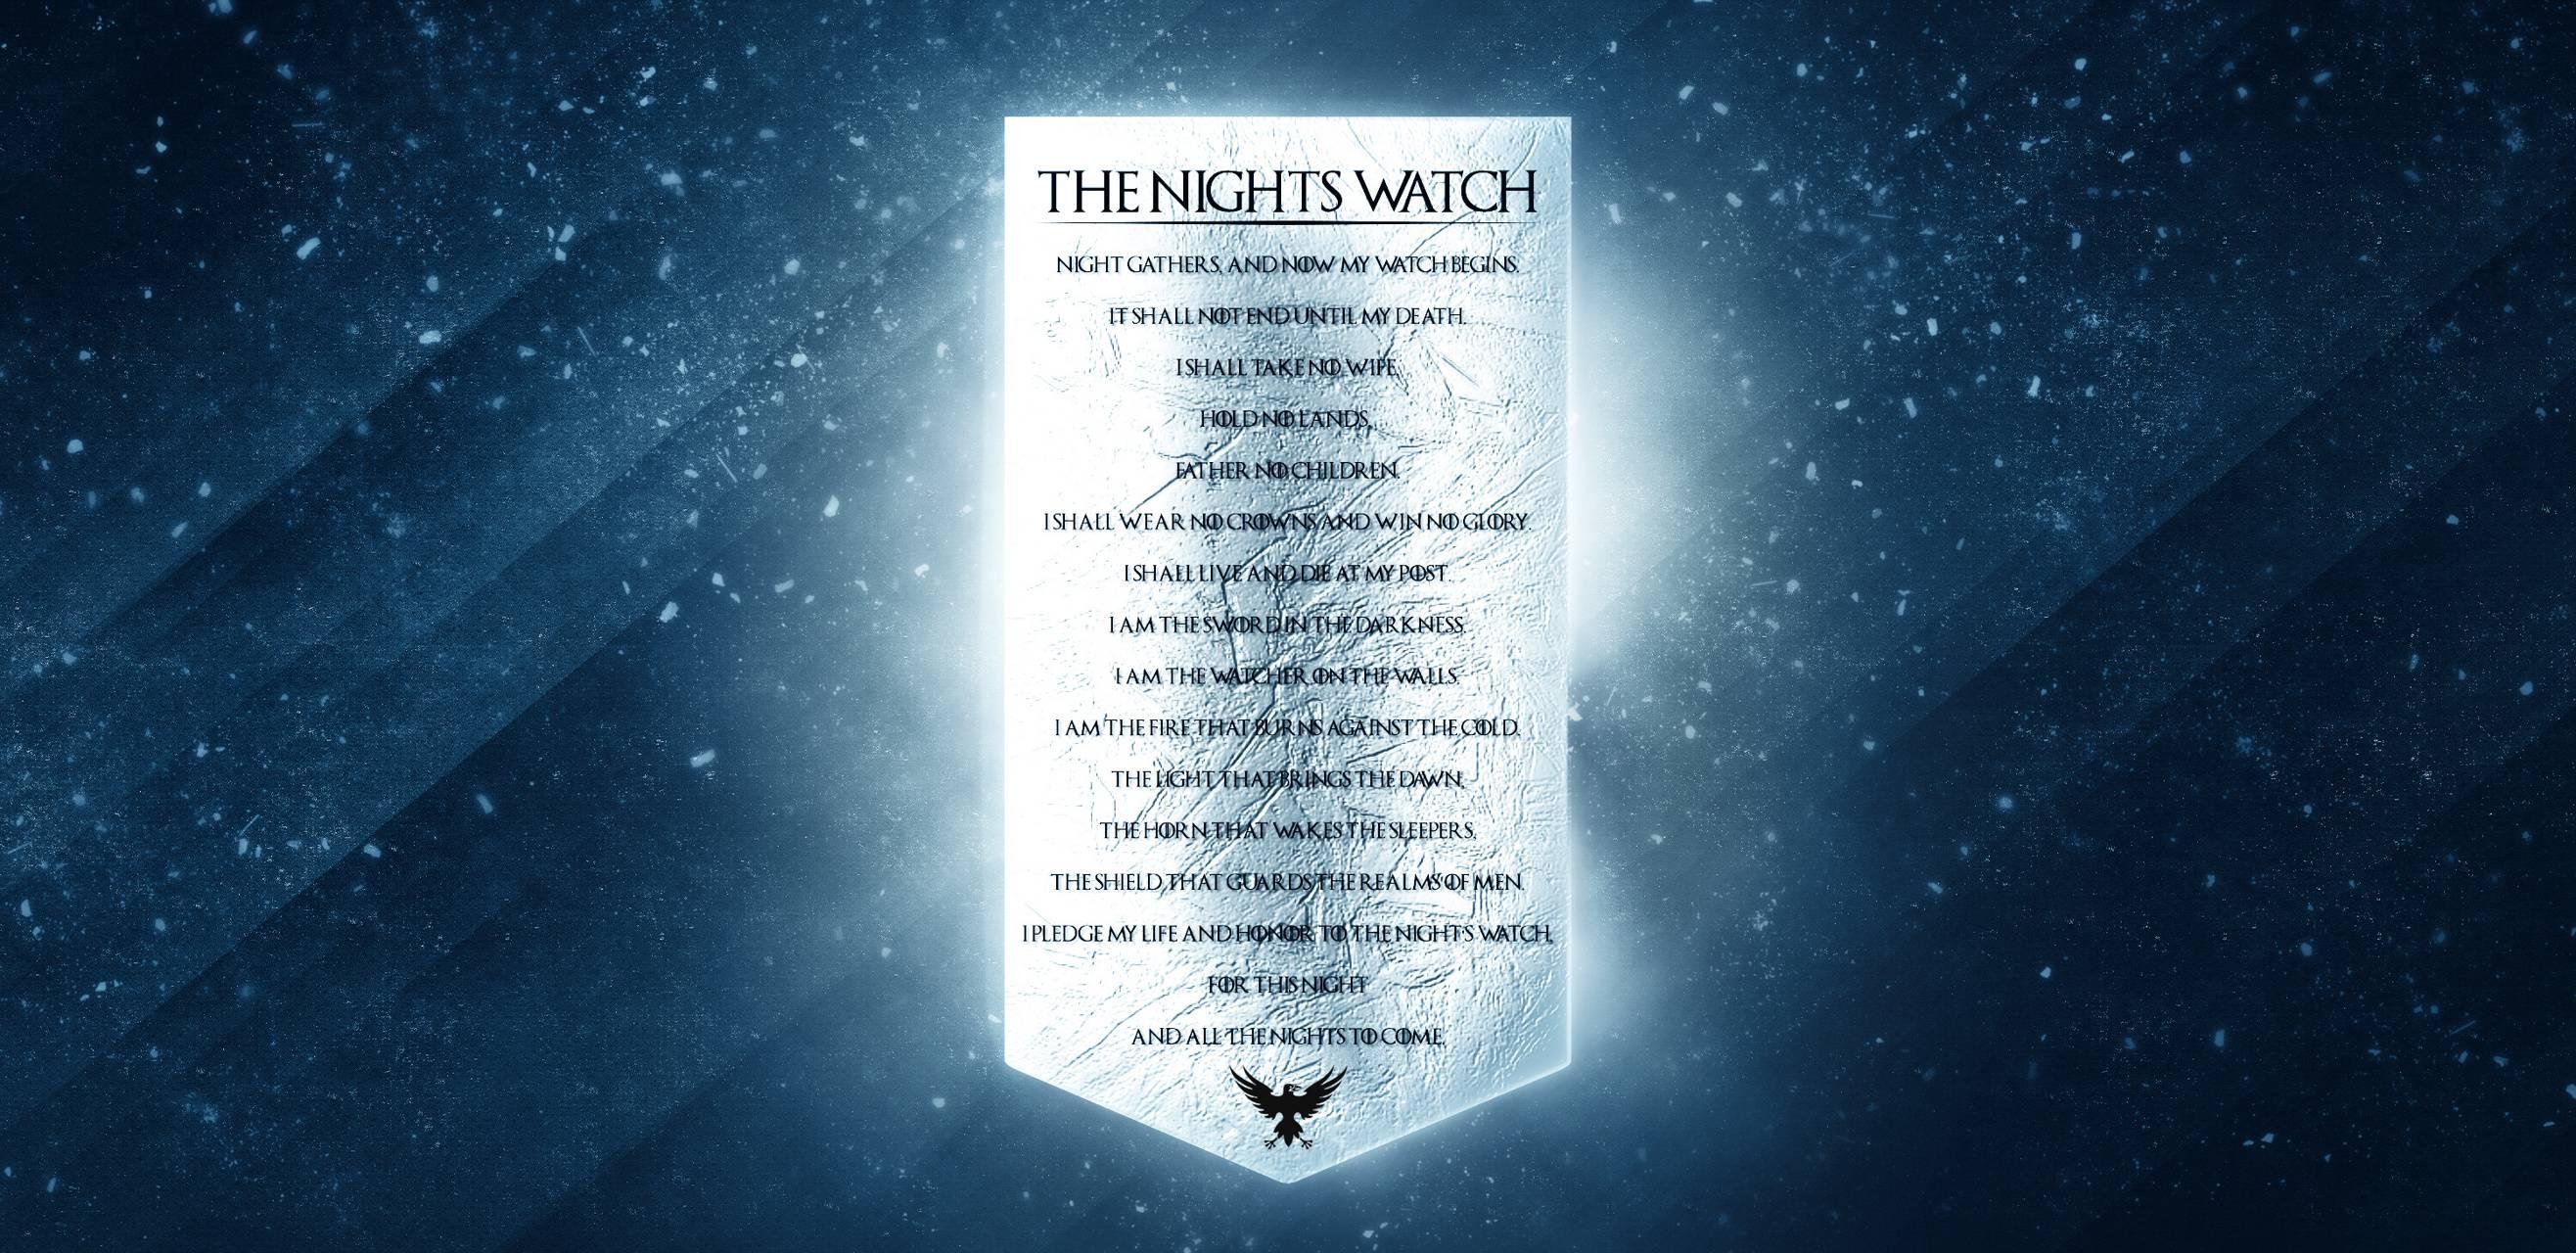 Nights Watch Vow